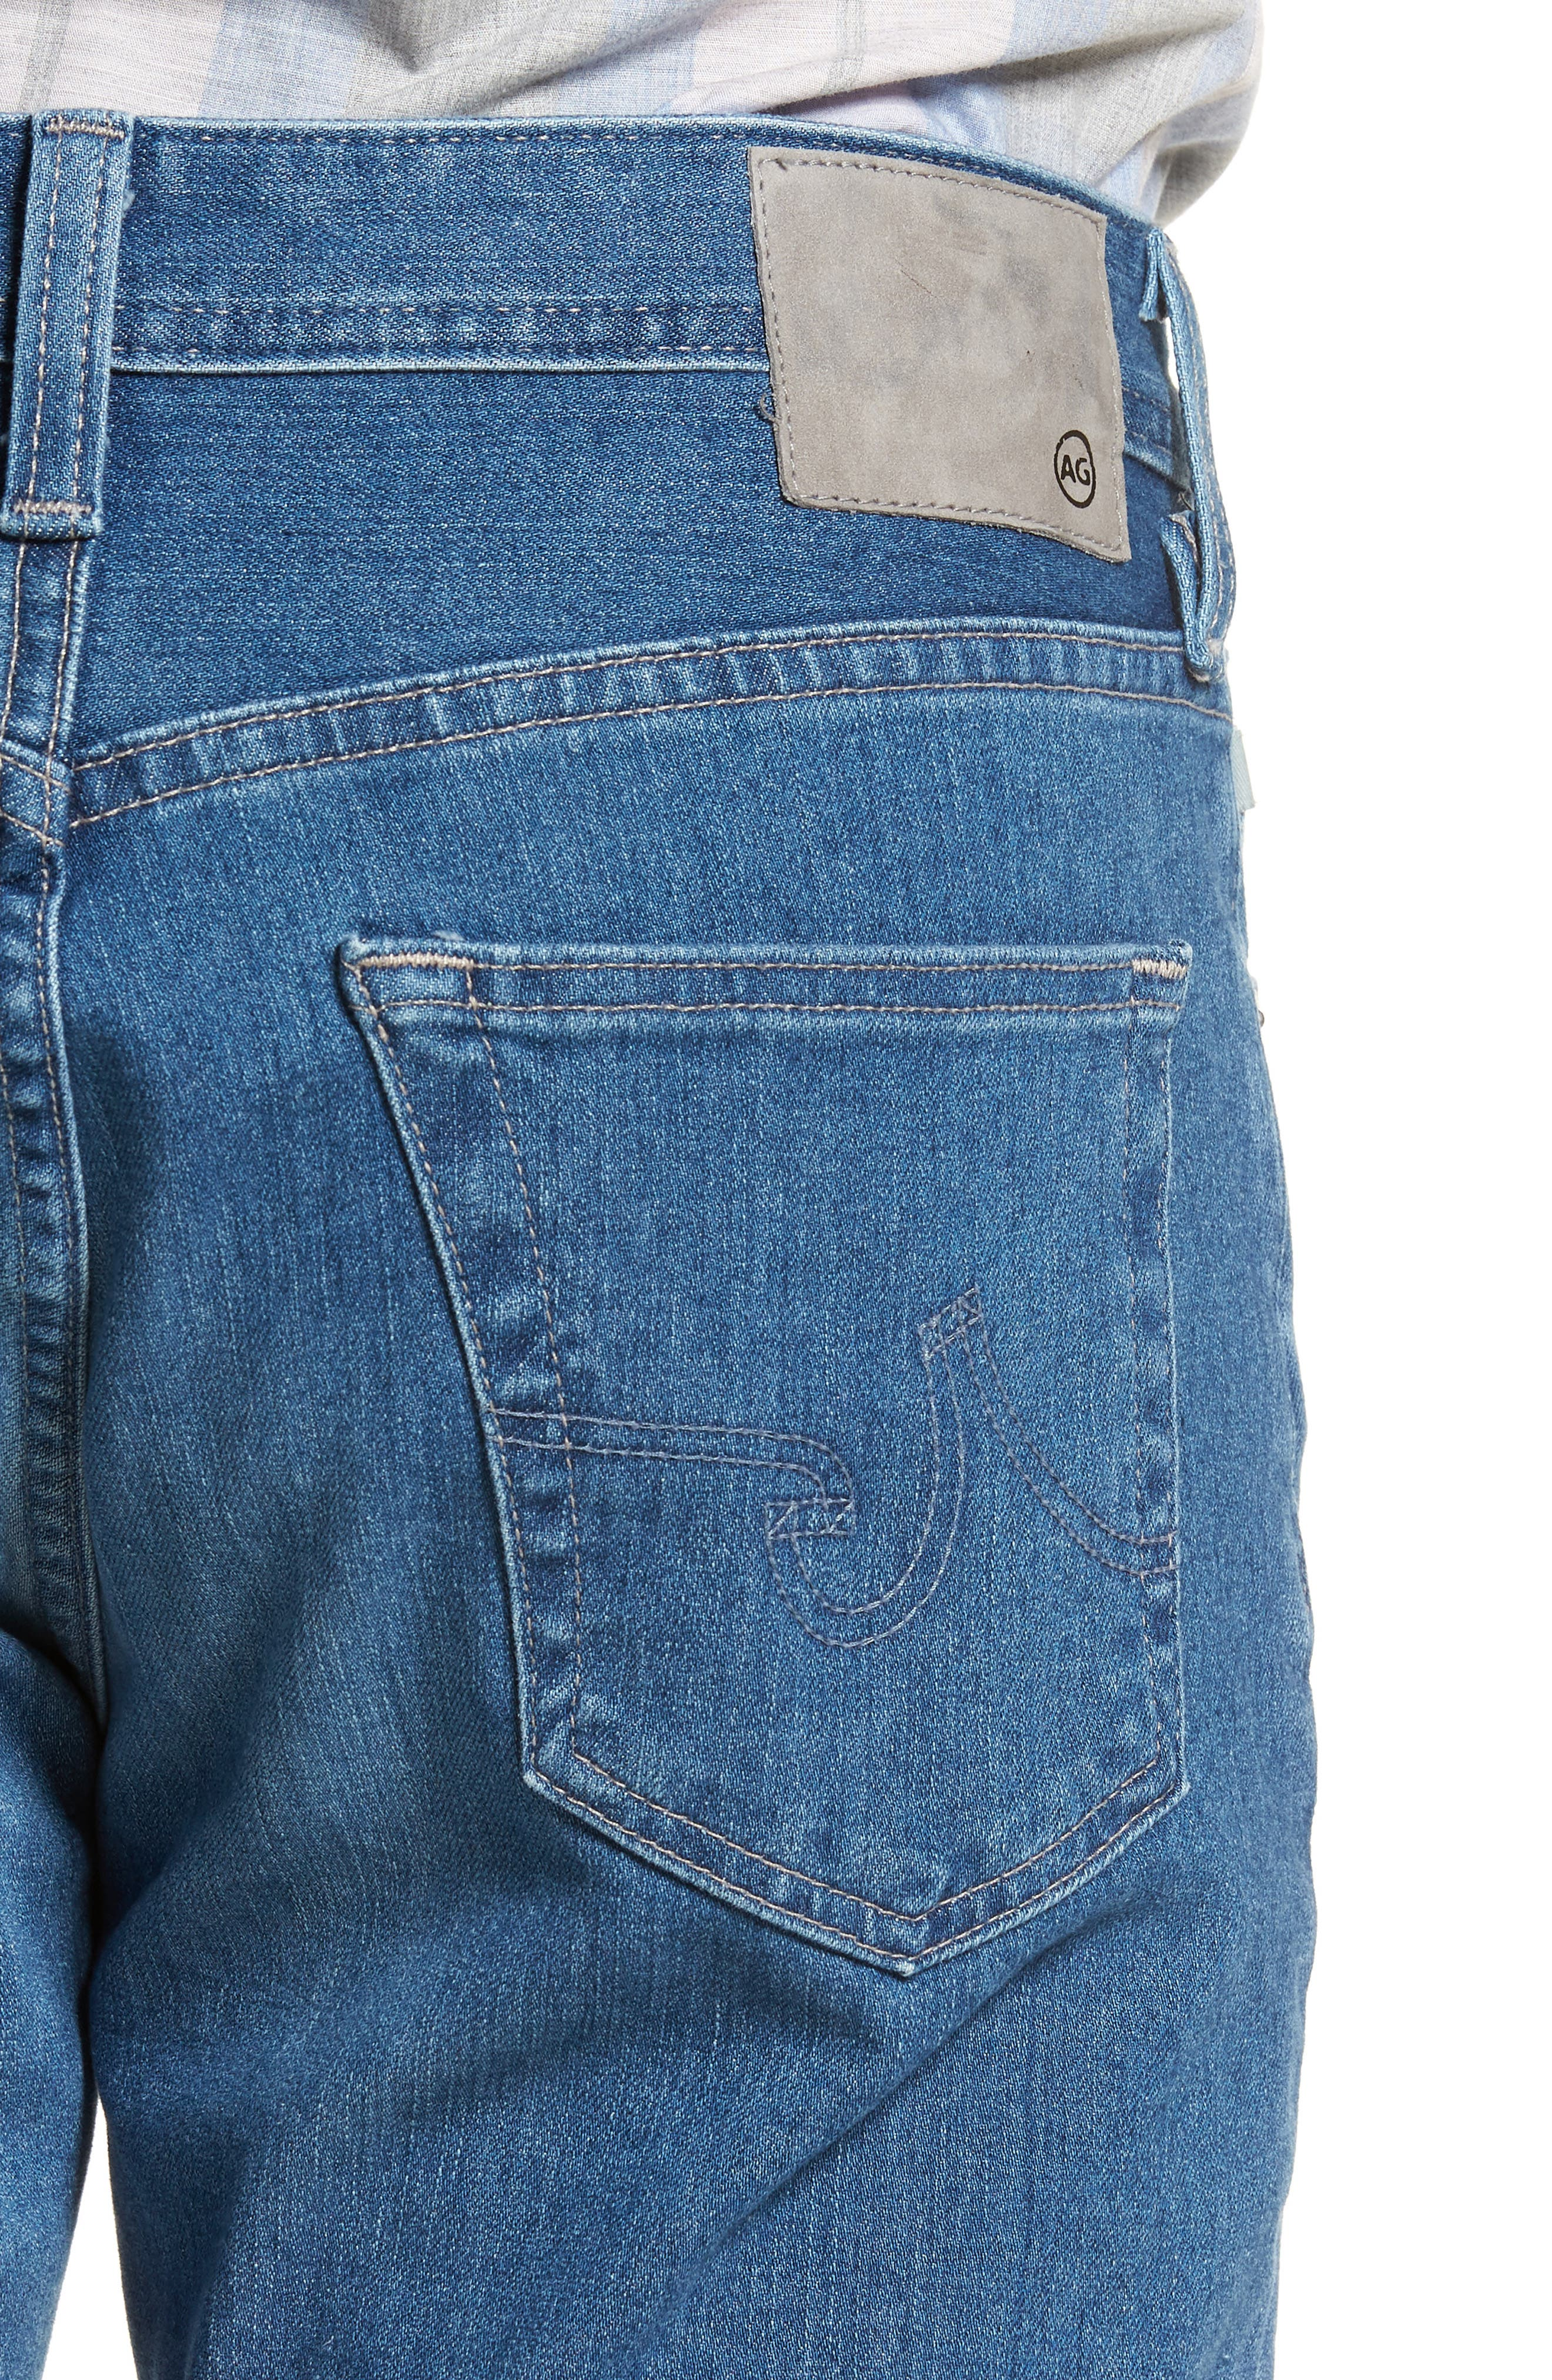 Everett Slim Straight Leg Jeans,                             Alternate thumbnail 4, color,                             SEA WAVE